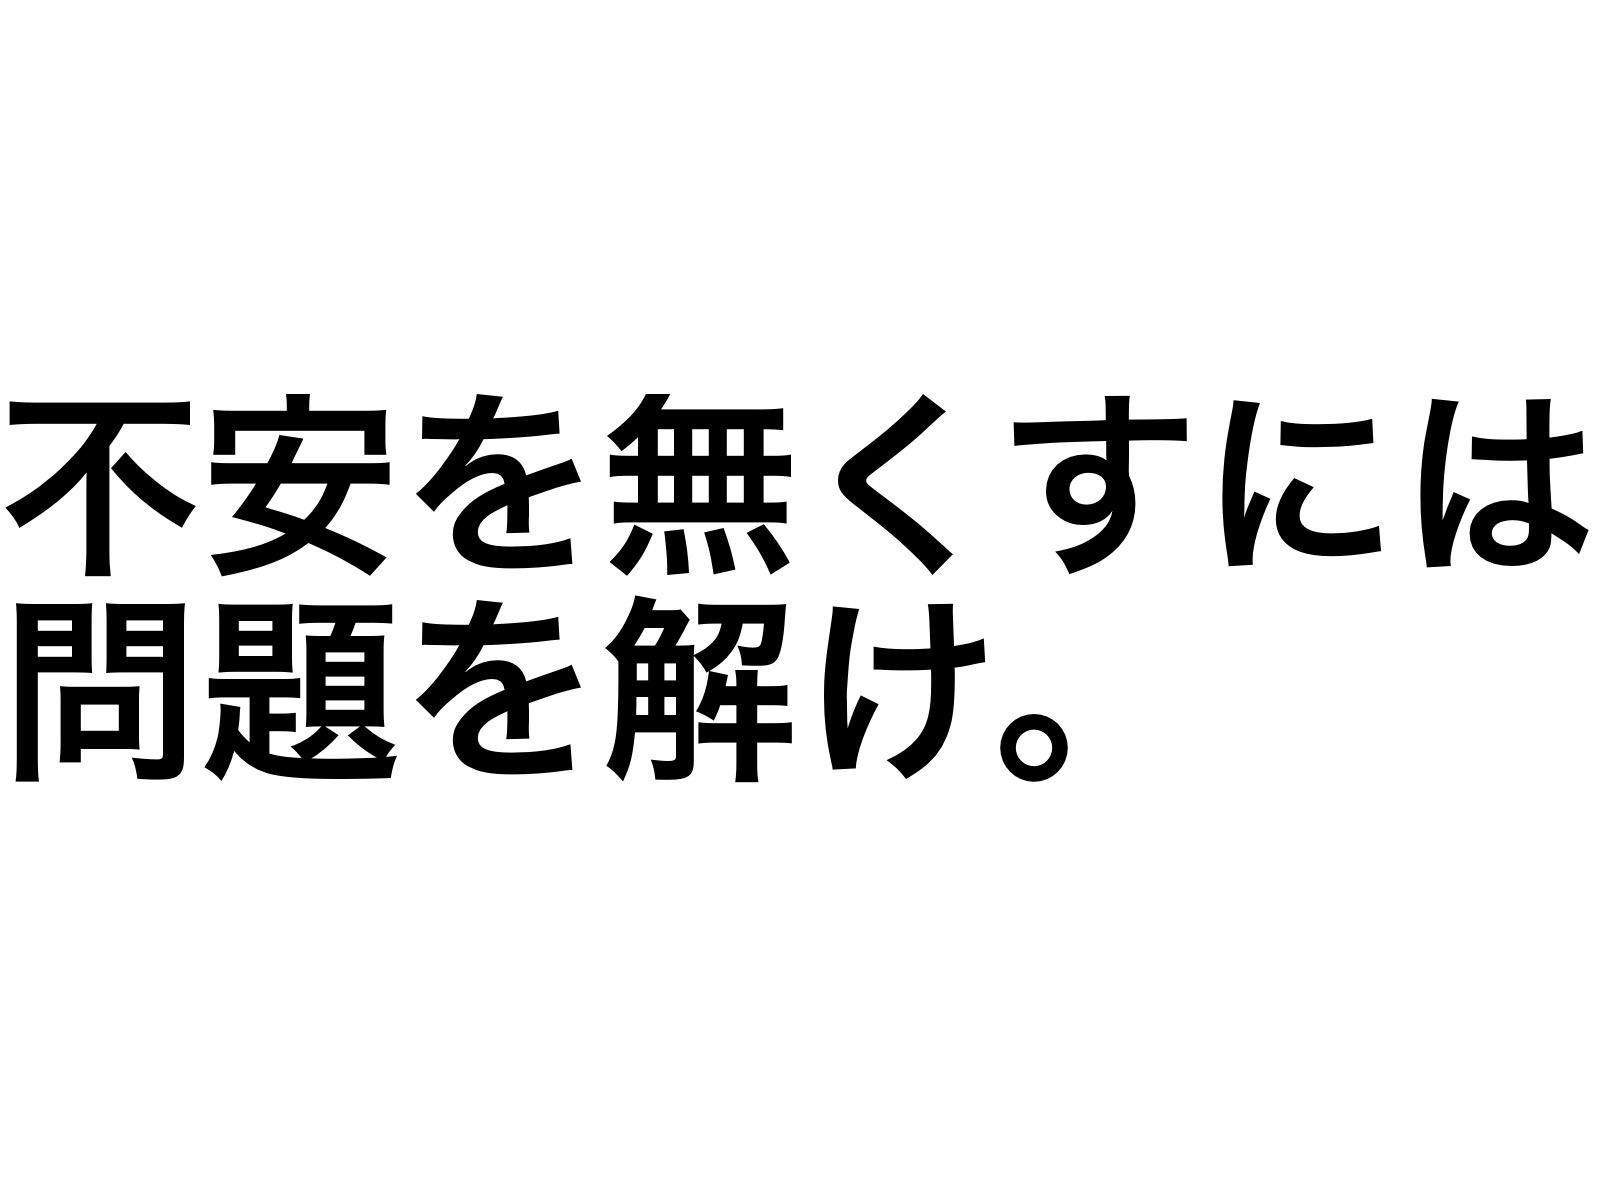 2017 01 03 20 33 30